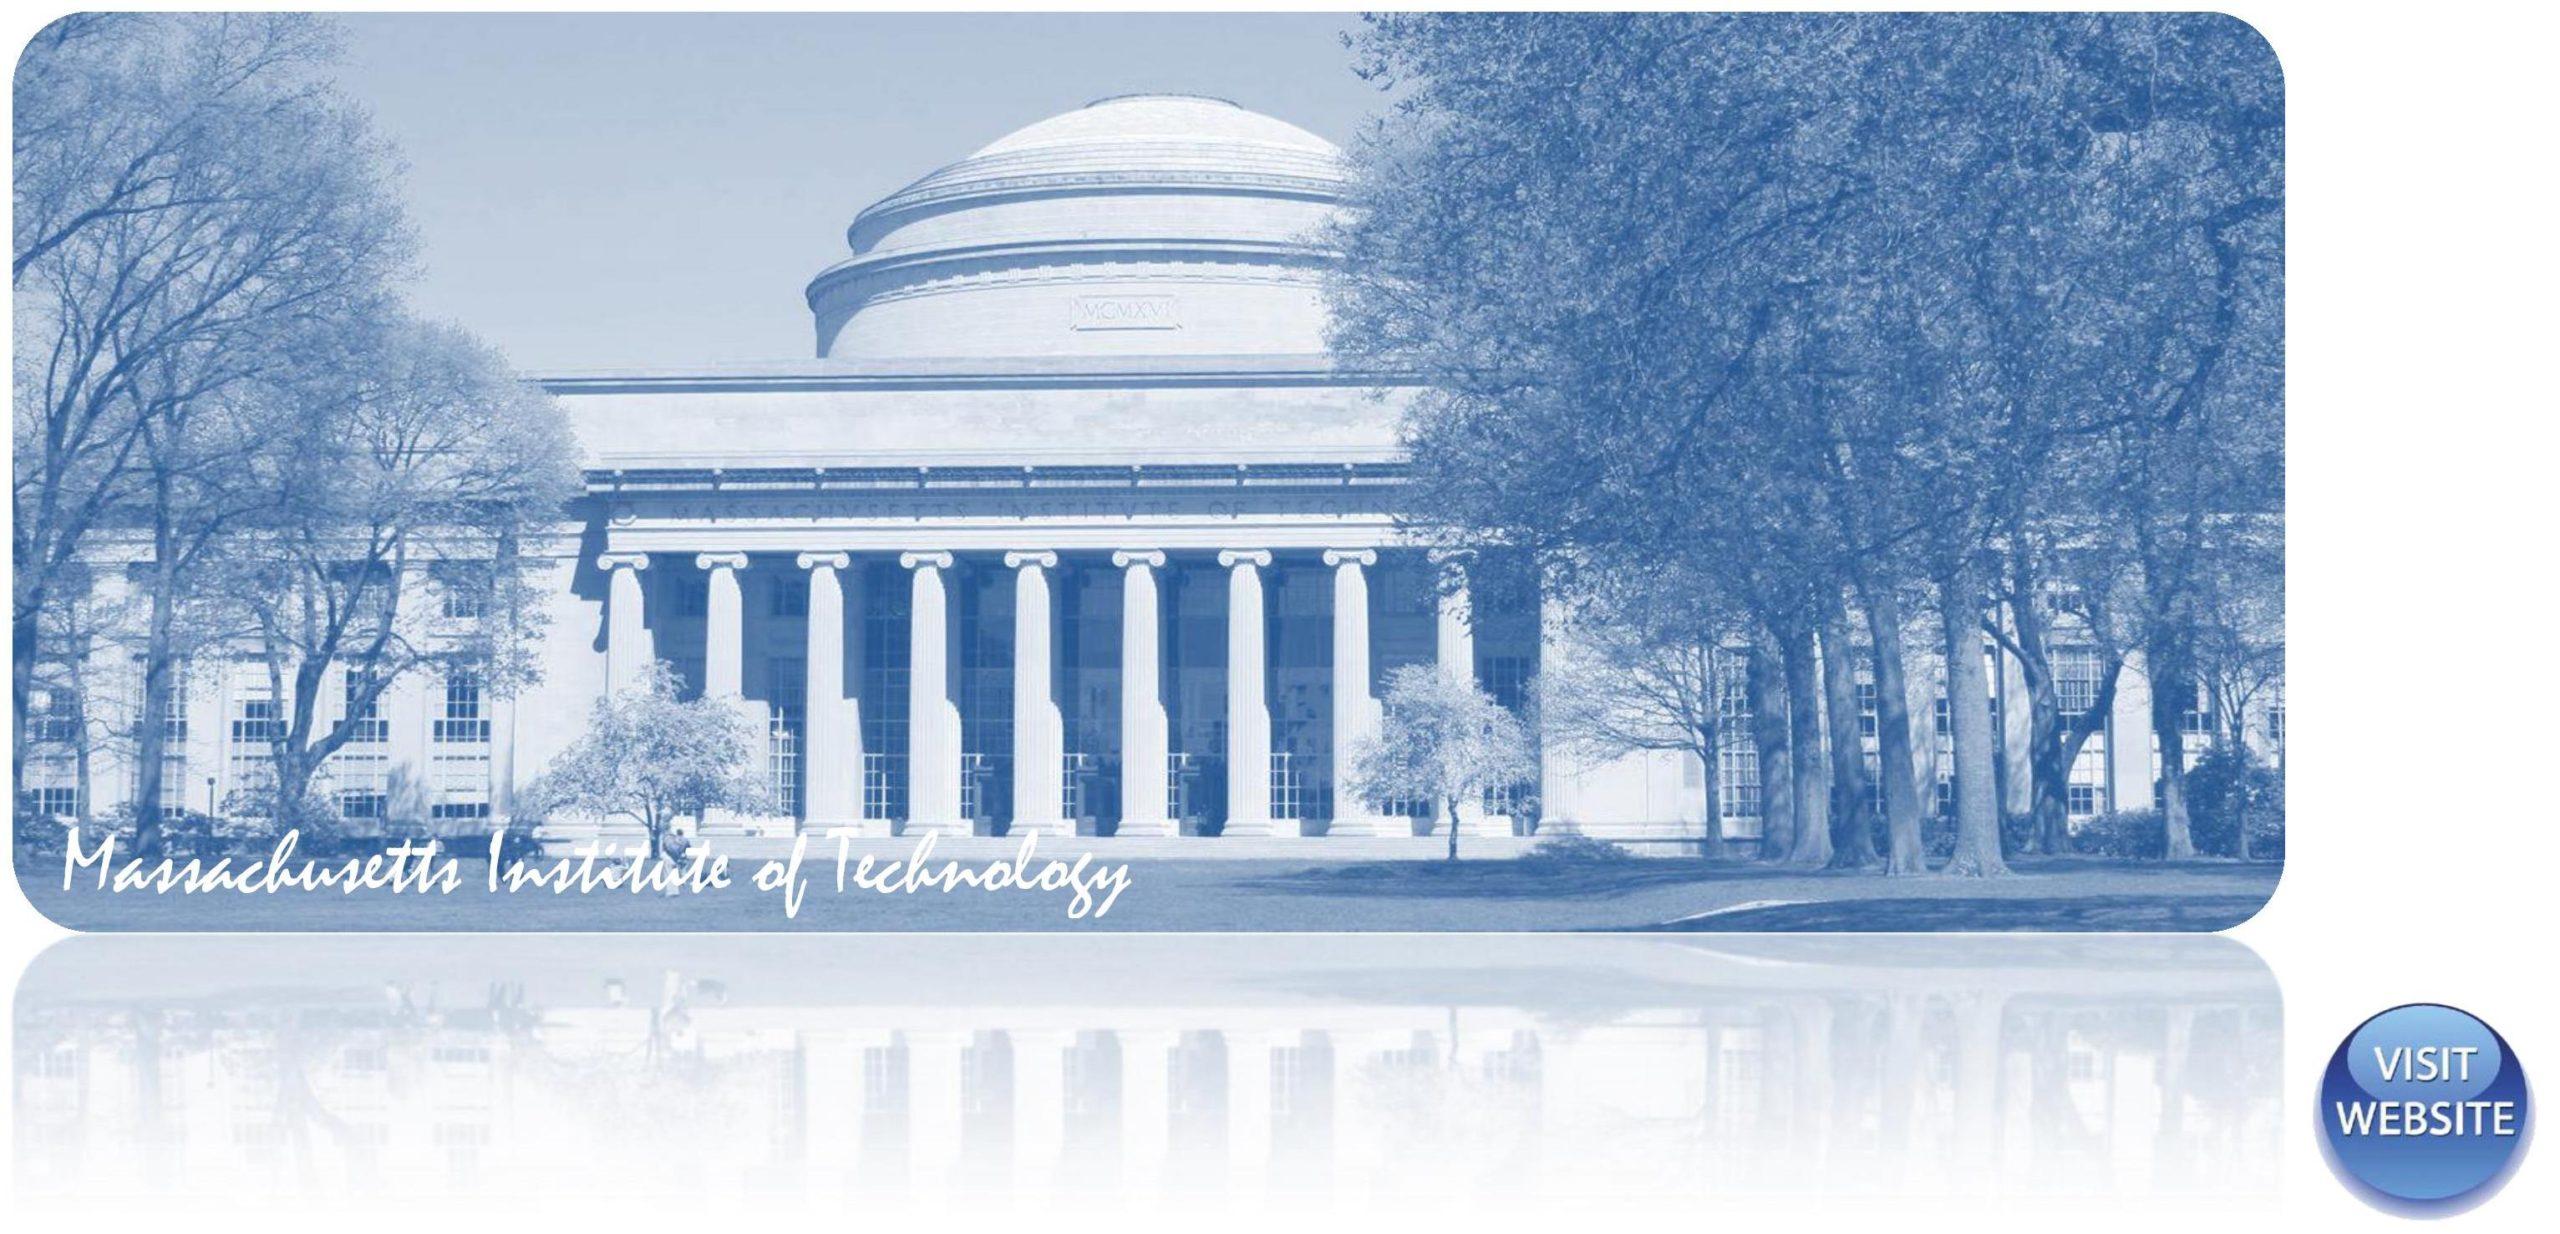 Massachusetts Institute of Technology USA